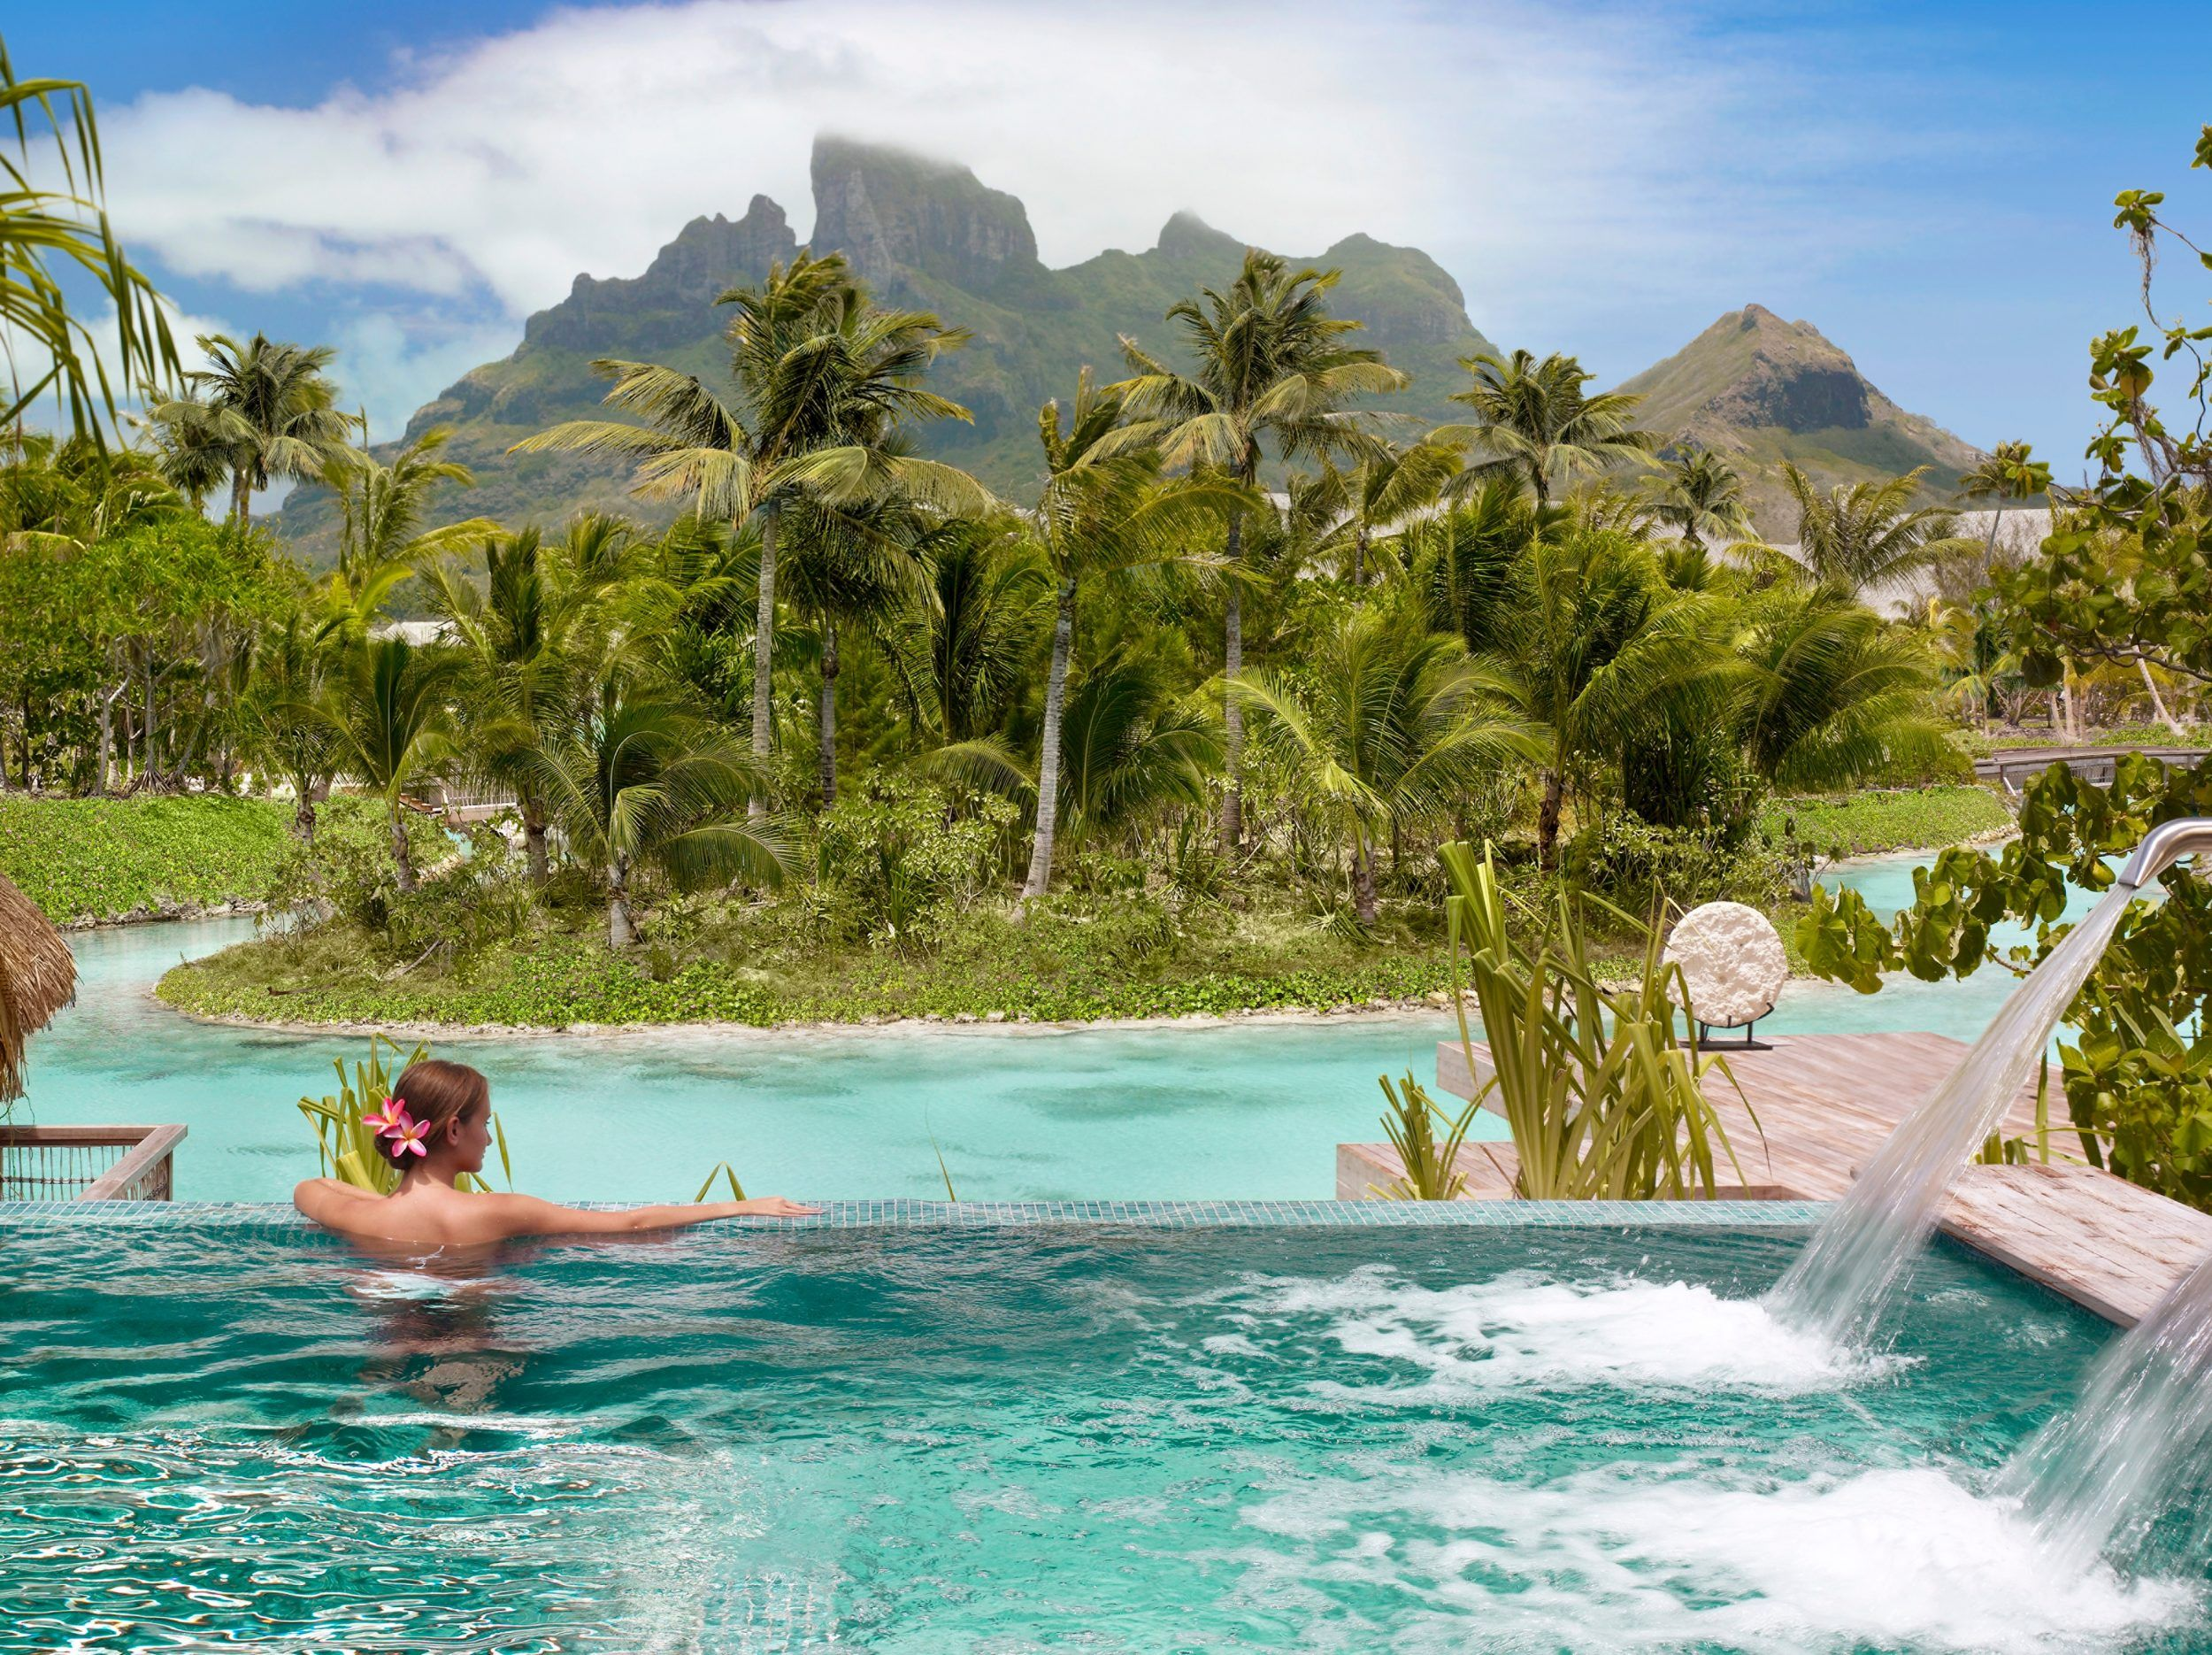 Honeymoon Indulgence Vacation Package Featuring Sofitel Moorea - Tahiti vacation packages